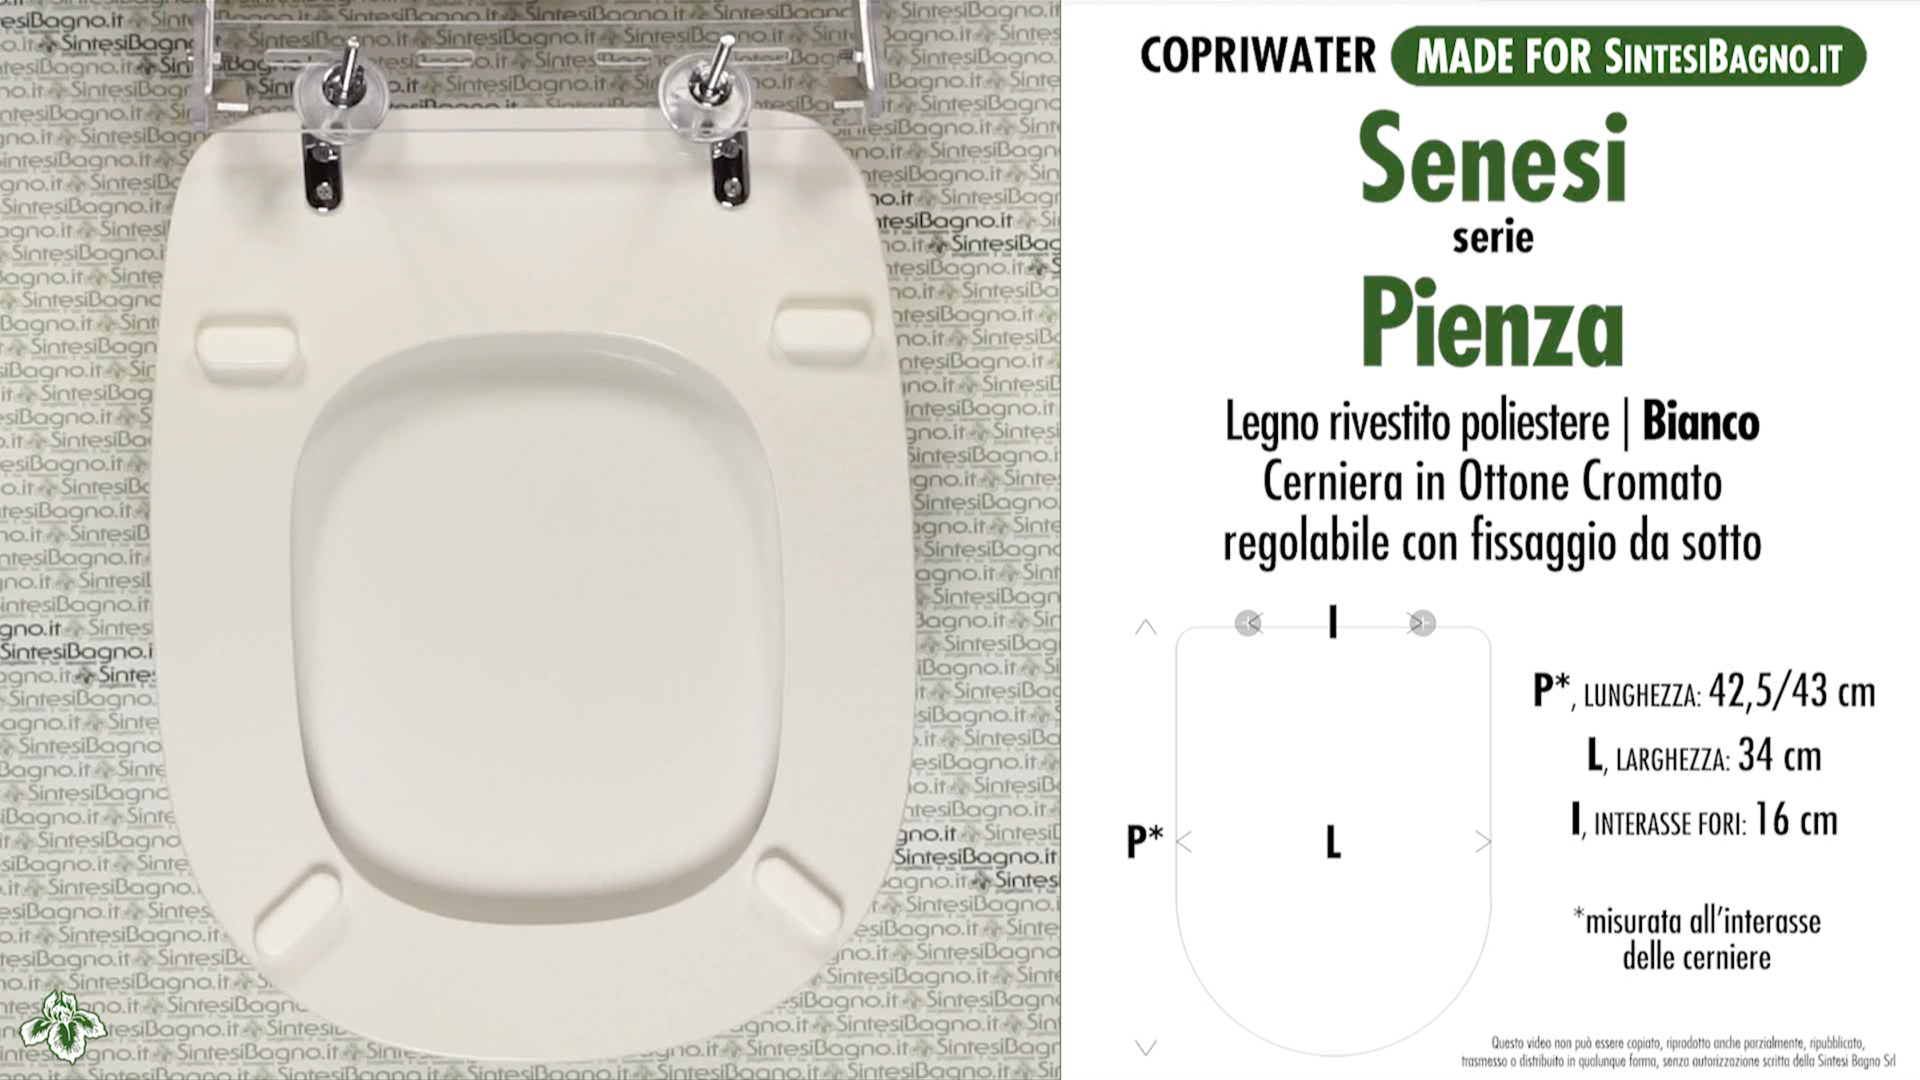 SCHEDA TECNICA MISURE copriwater SENESI PIENZA